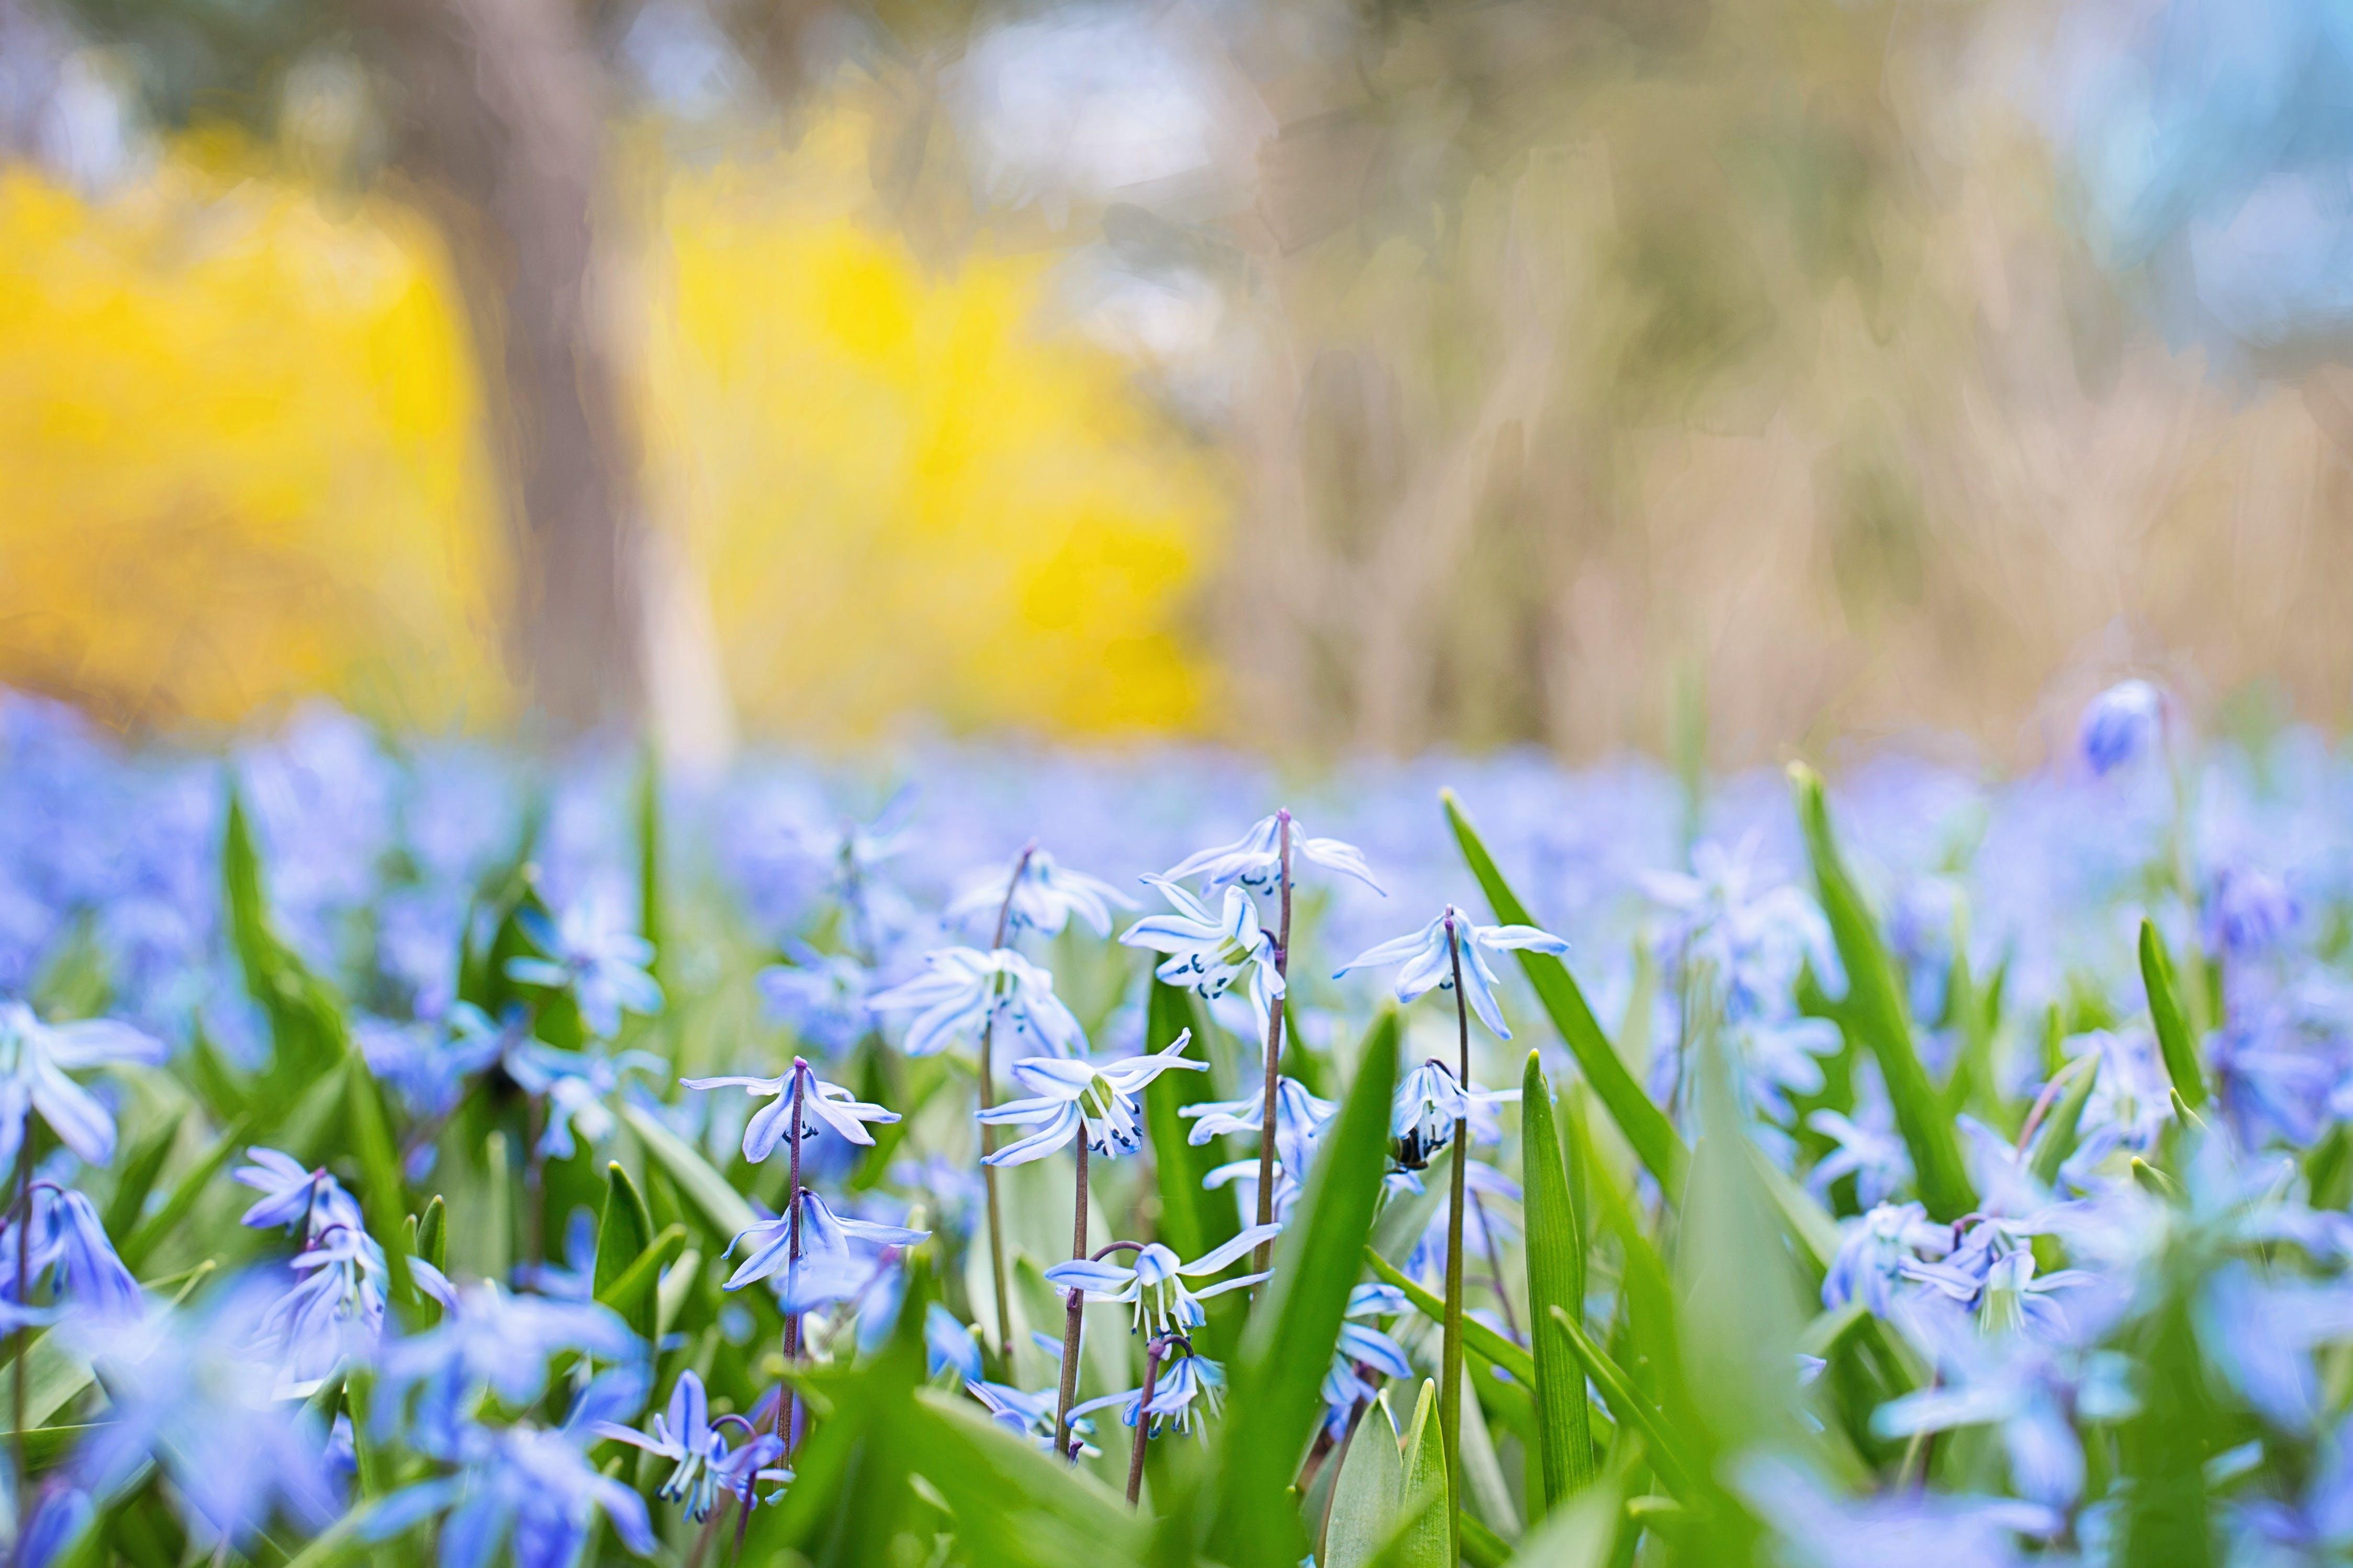 Selective Focus of Lavender Petal Flowers